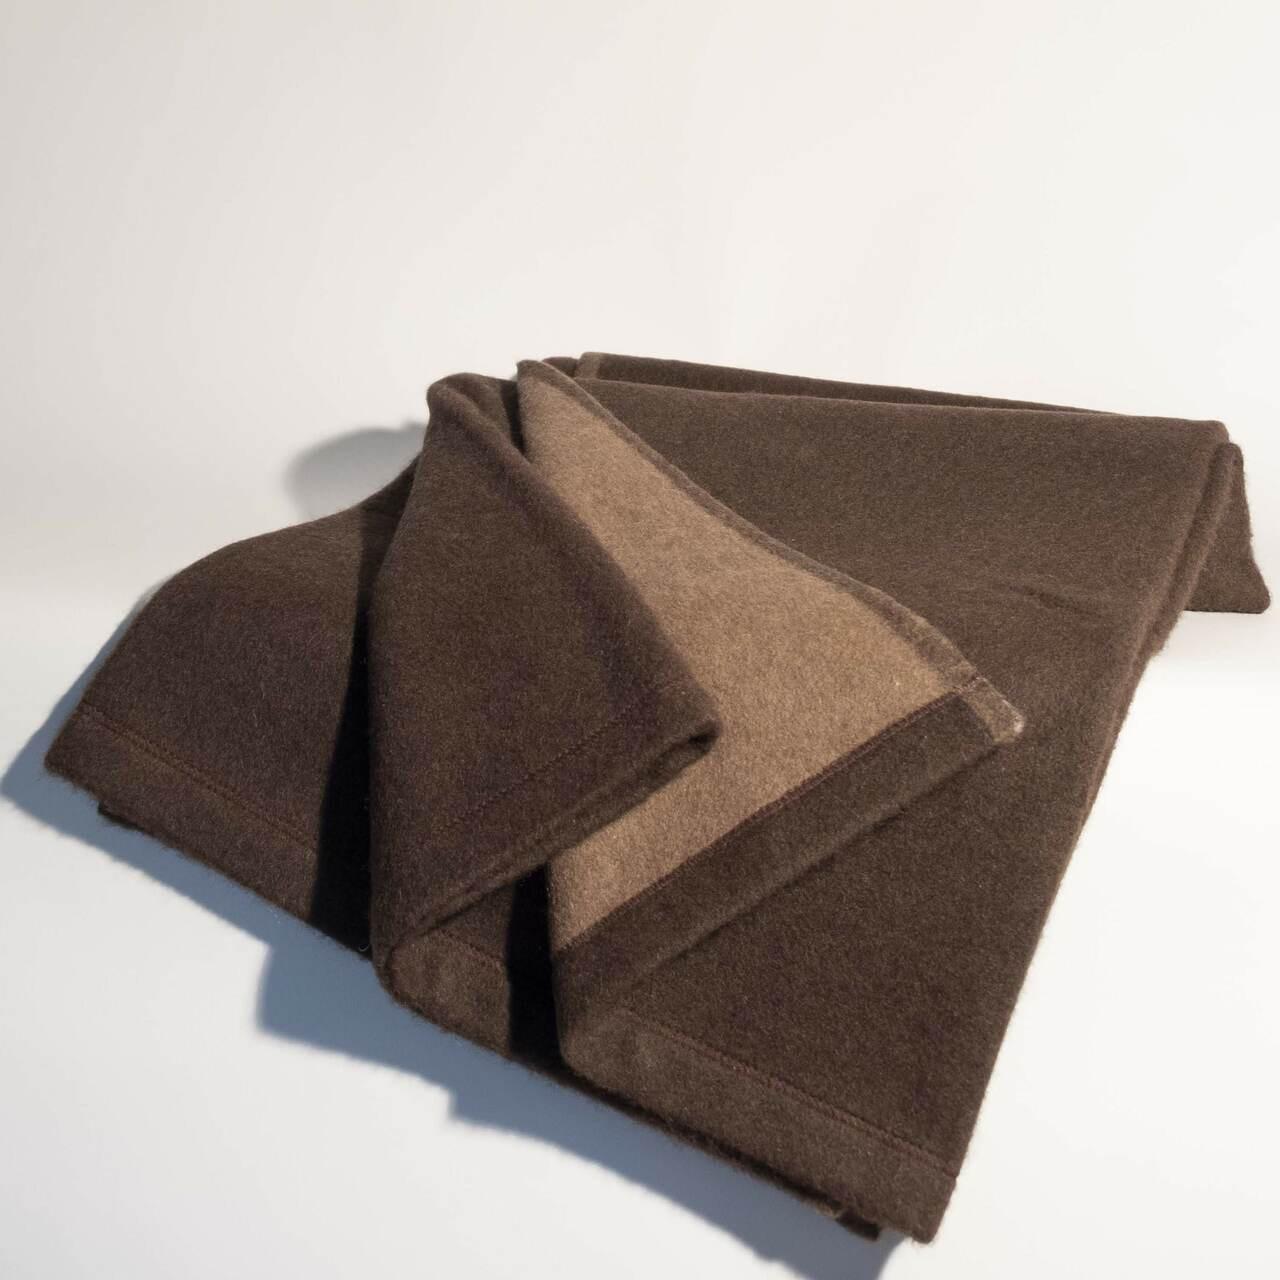 Heavy Chocolate Yak Down Blanket